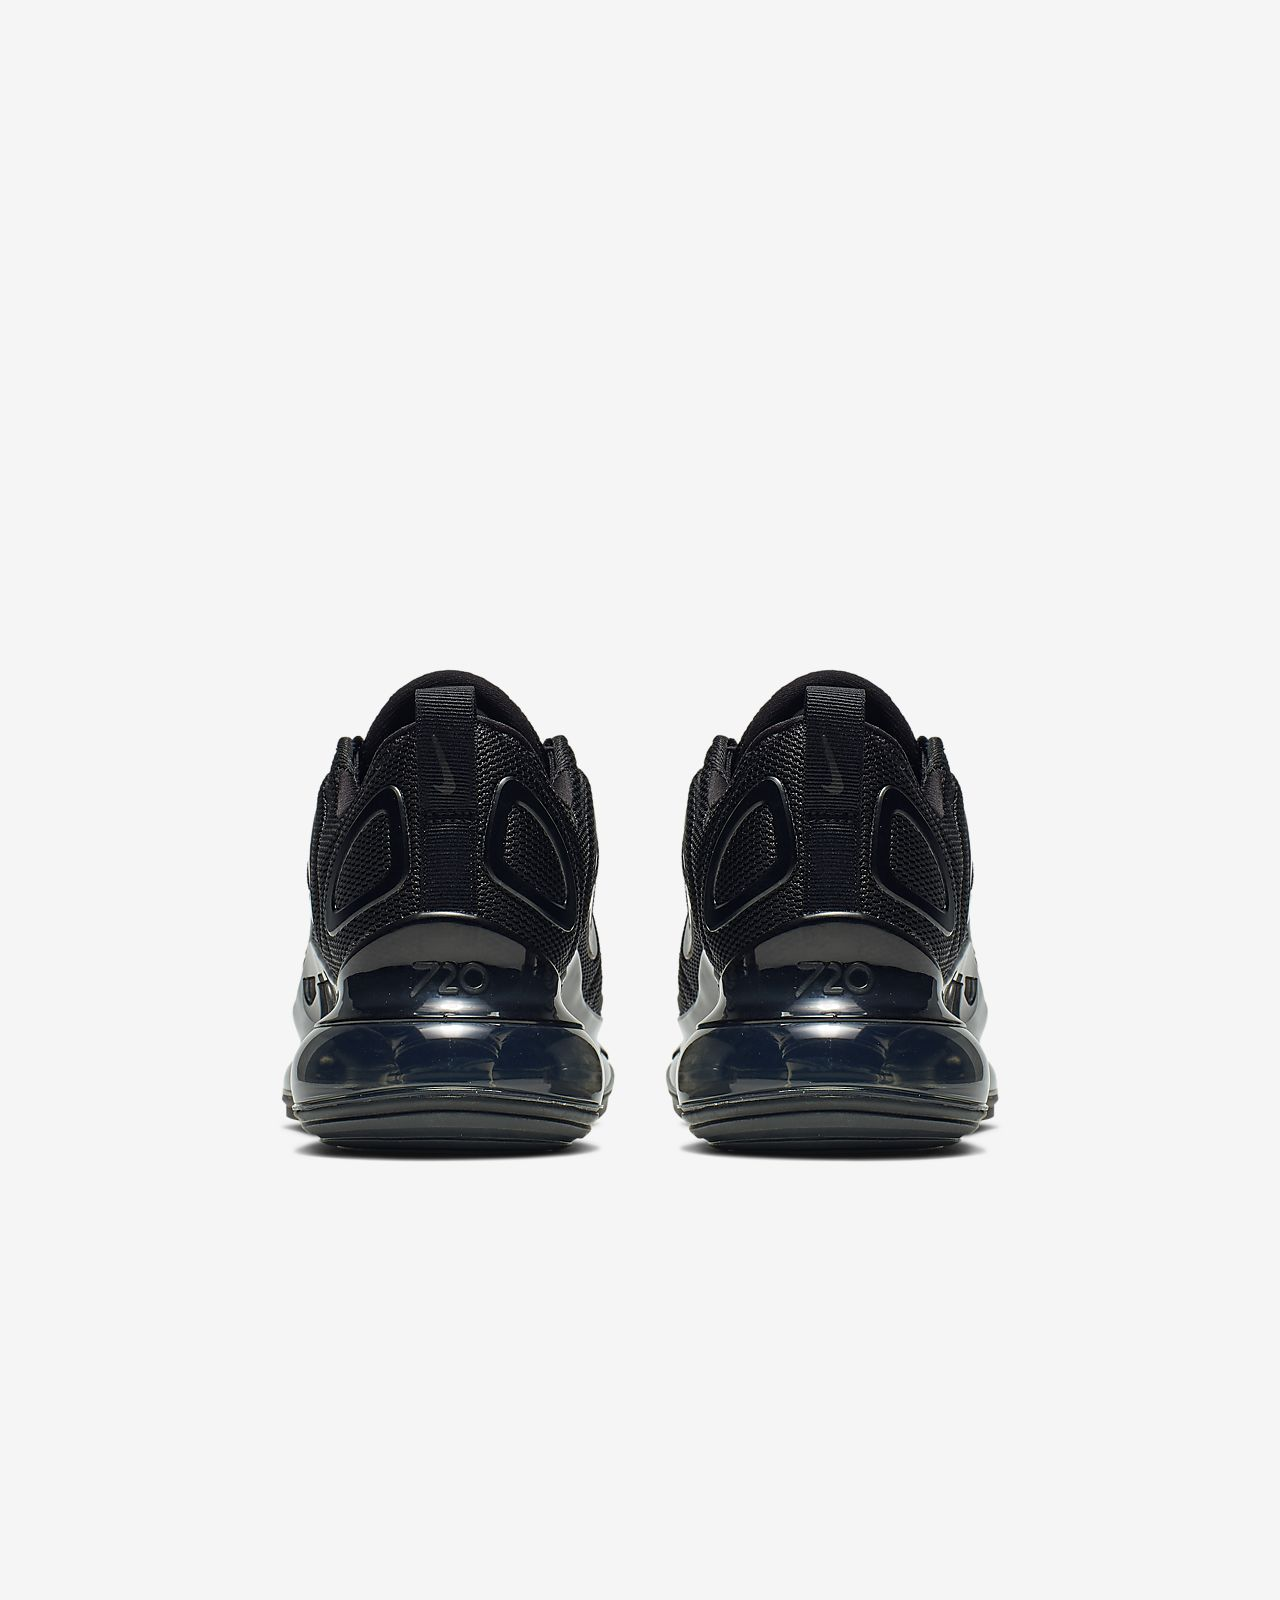 Nike Air Max 720 Schuh für jüngereältere Kinder